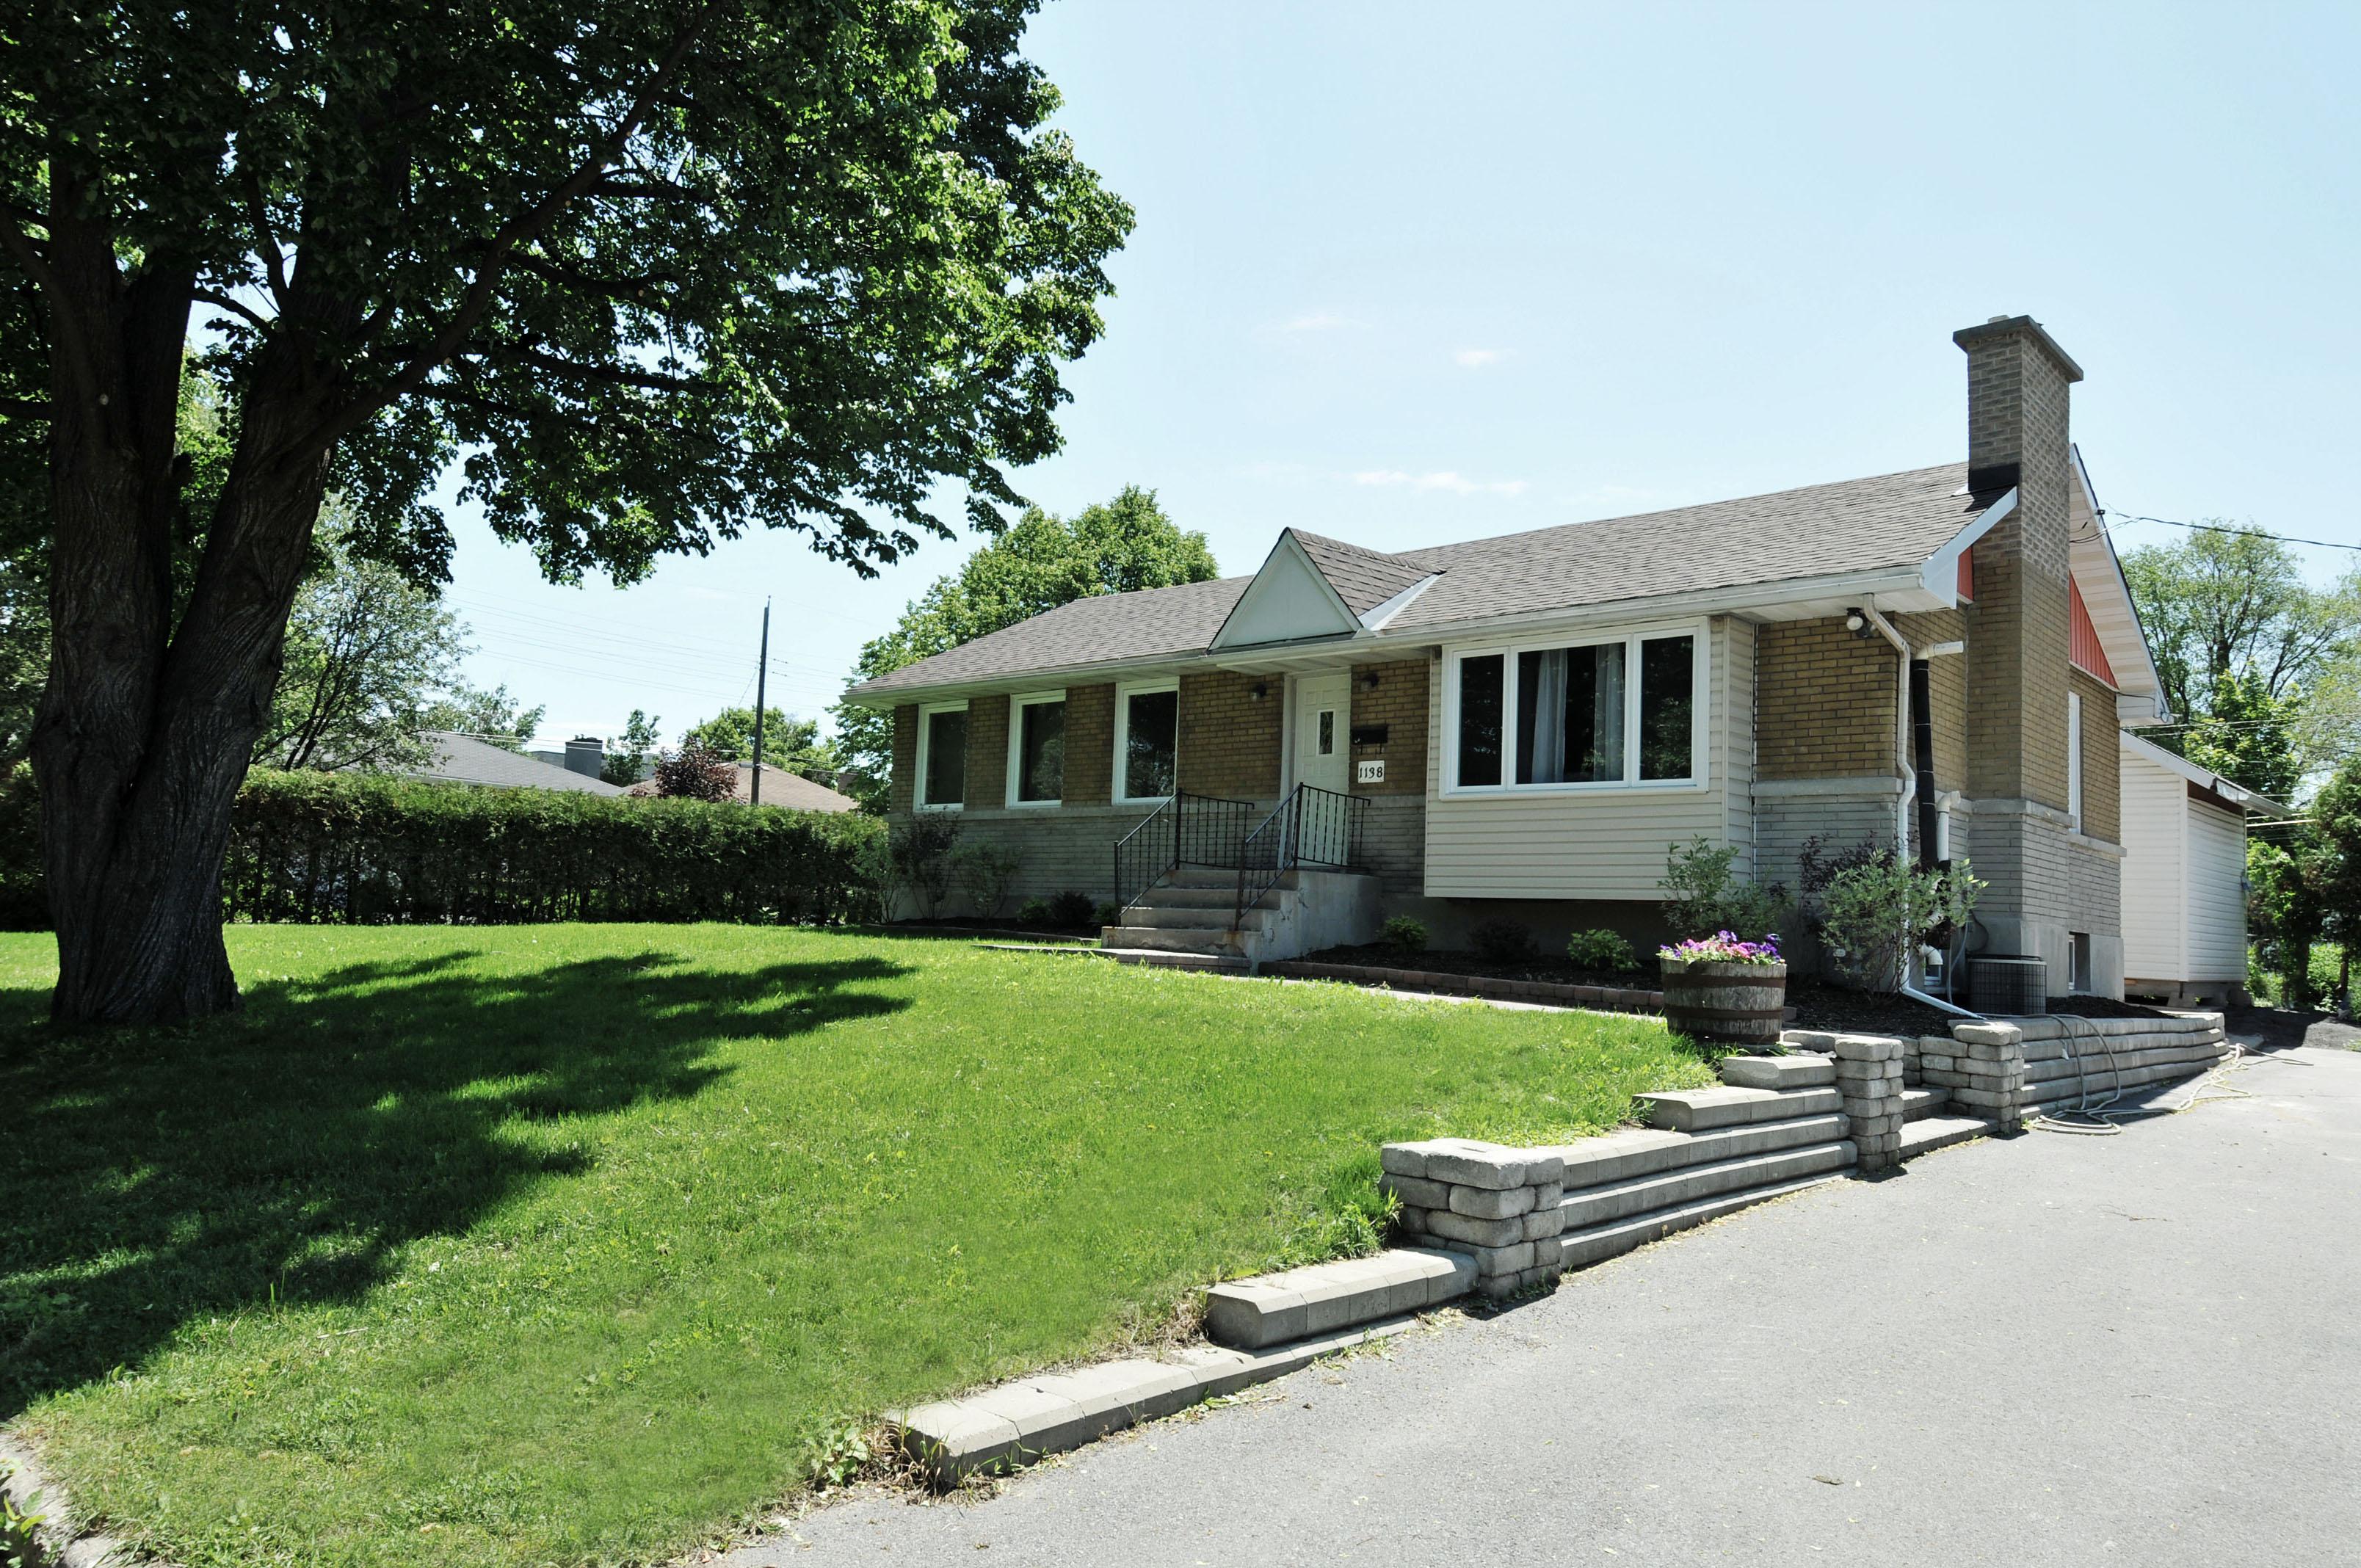 1138 Guertin Avenue brick bungalow